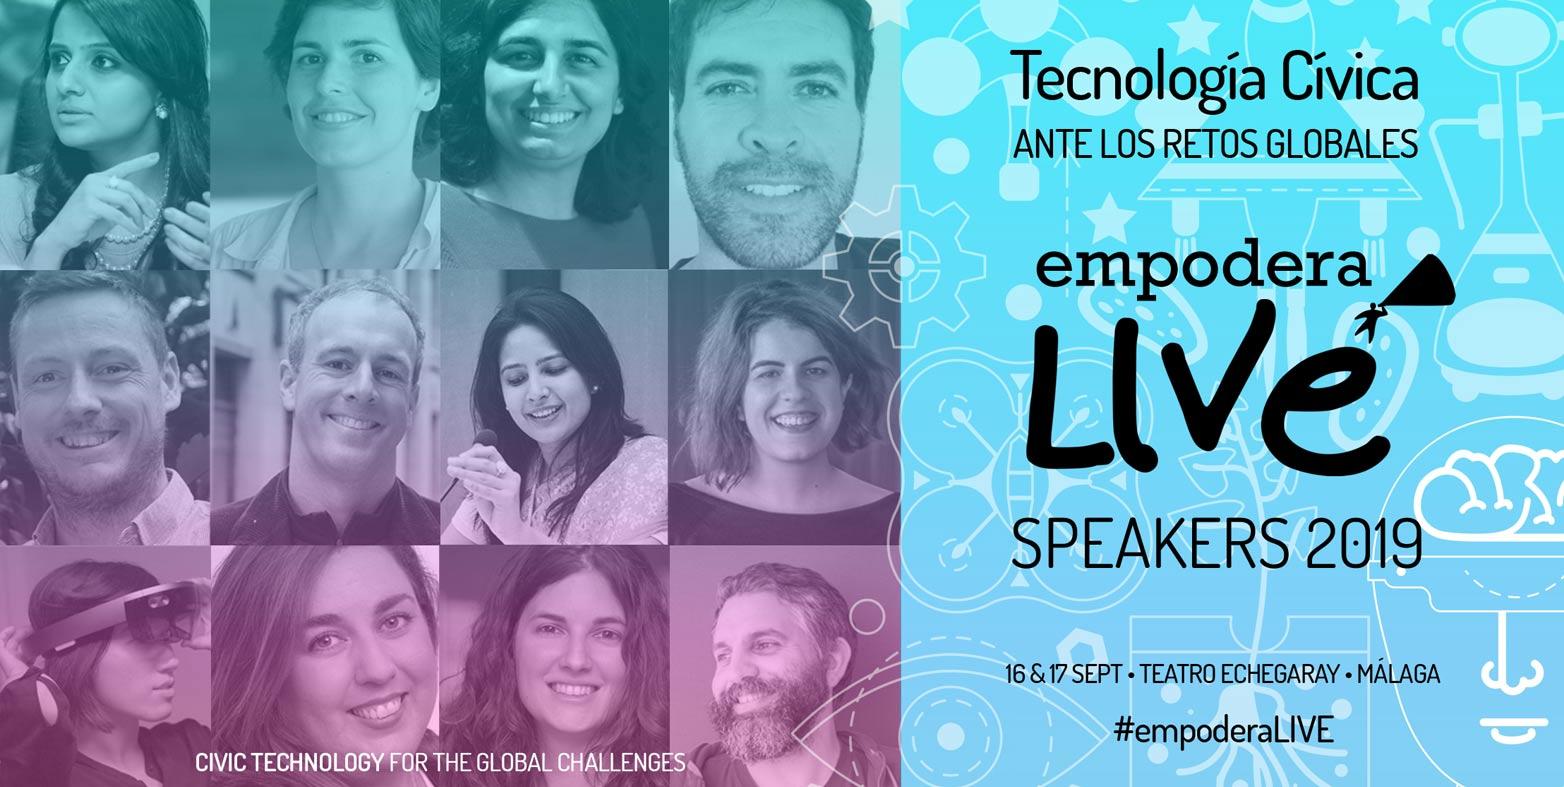 #EmpoderaLIVE 2019 reúne en Málaga a líderes en tecnología cívica que están cambiando el mundo